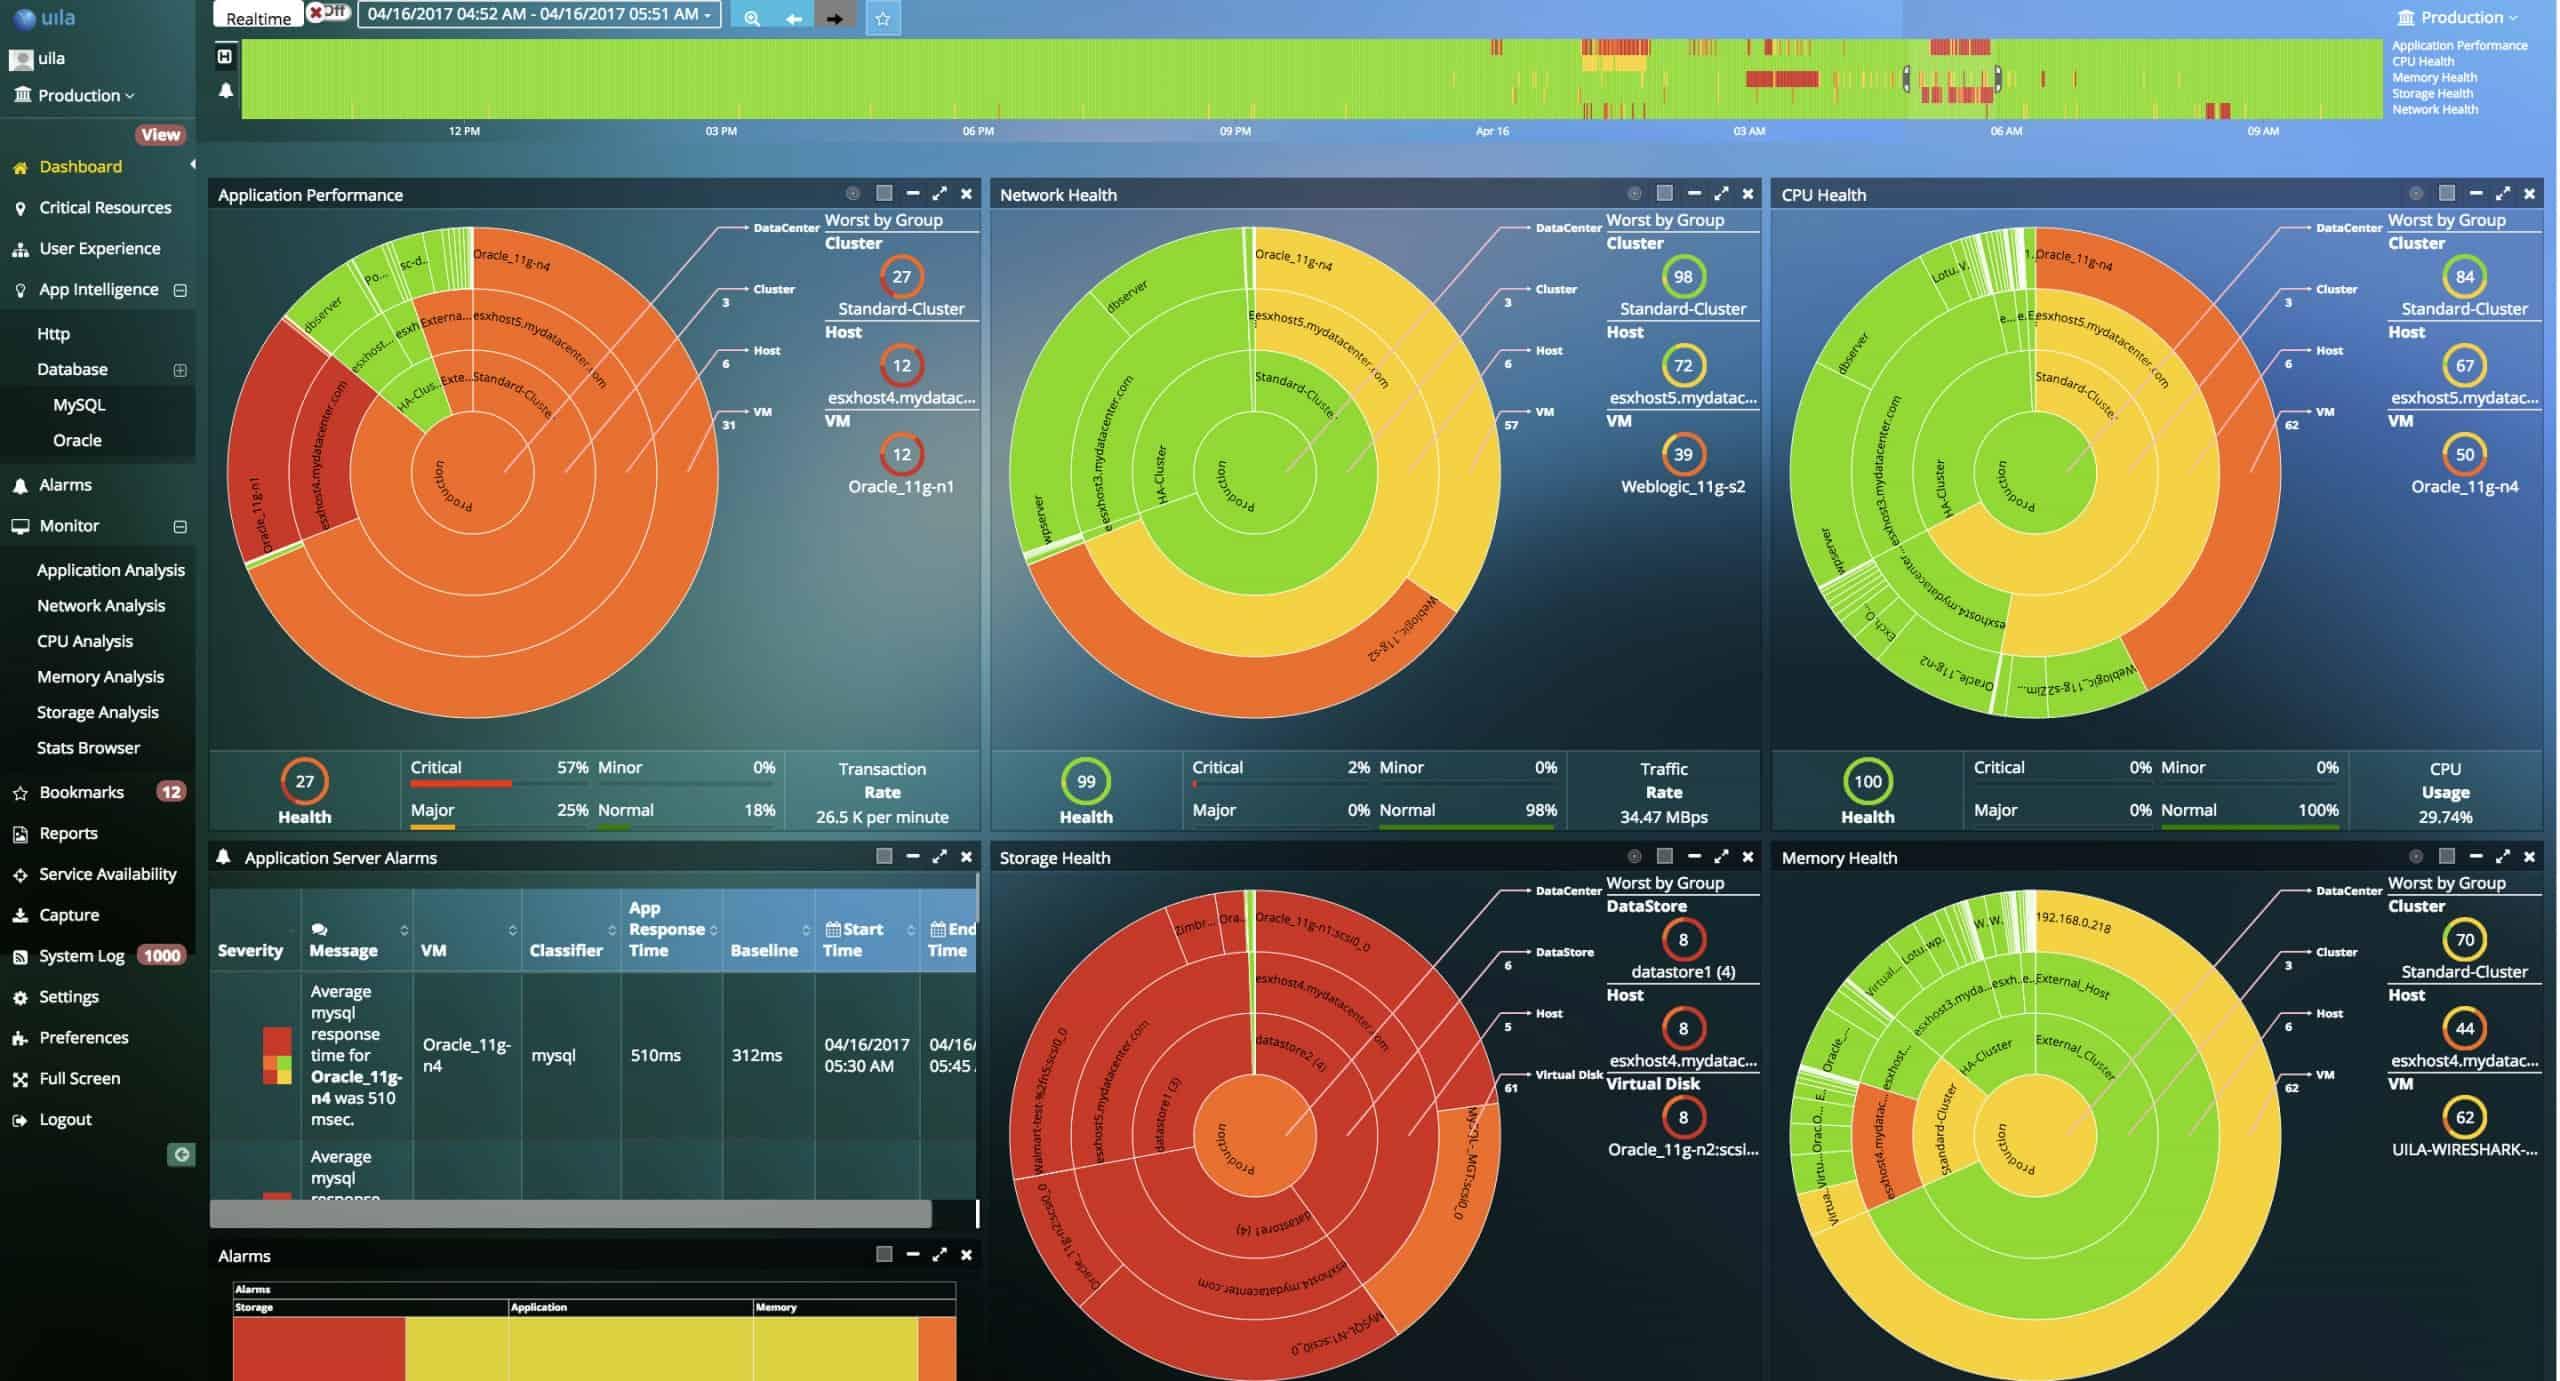 Uila application centric data center-monitoring tool